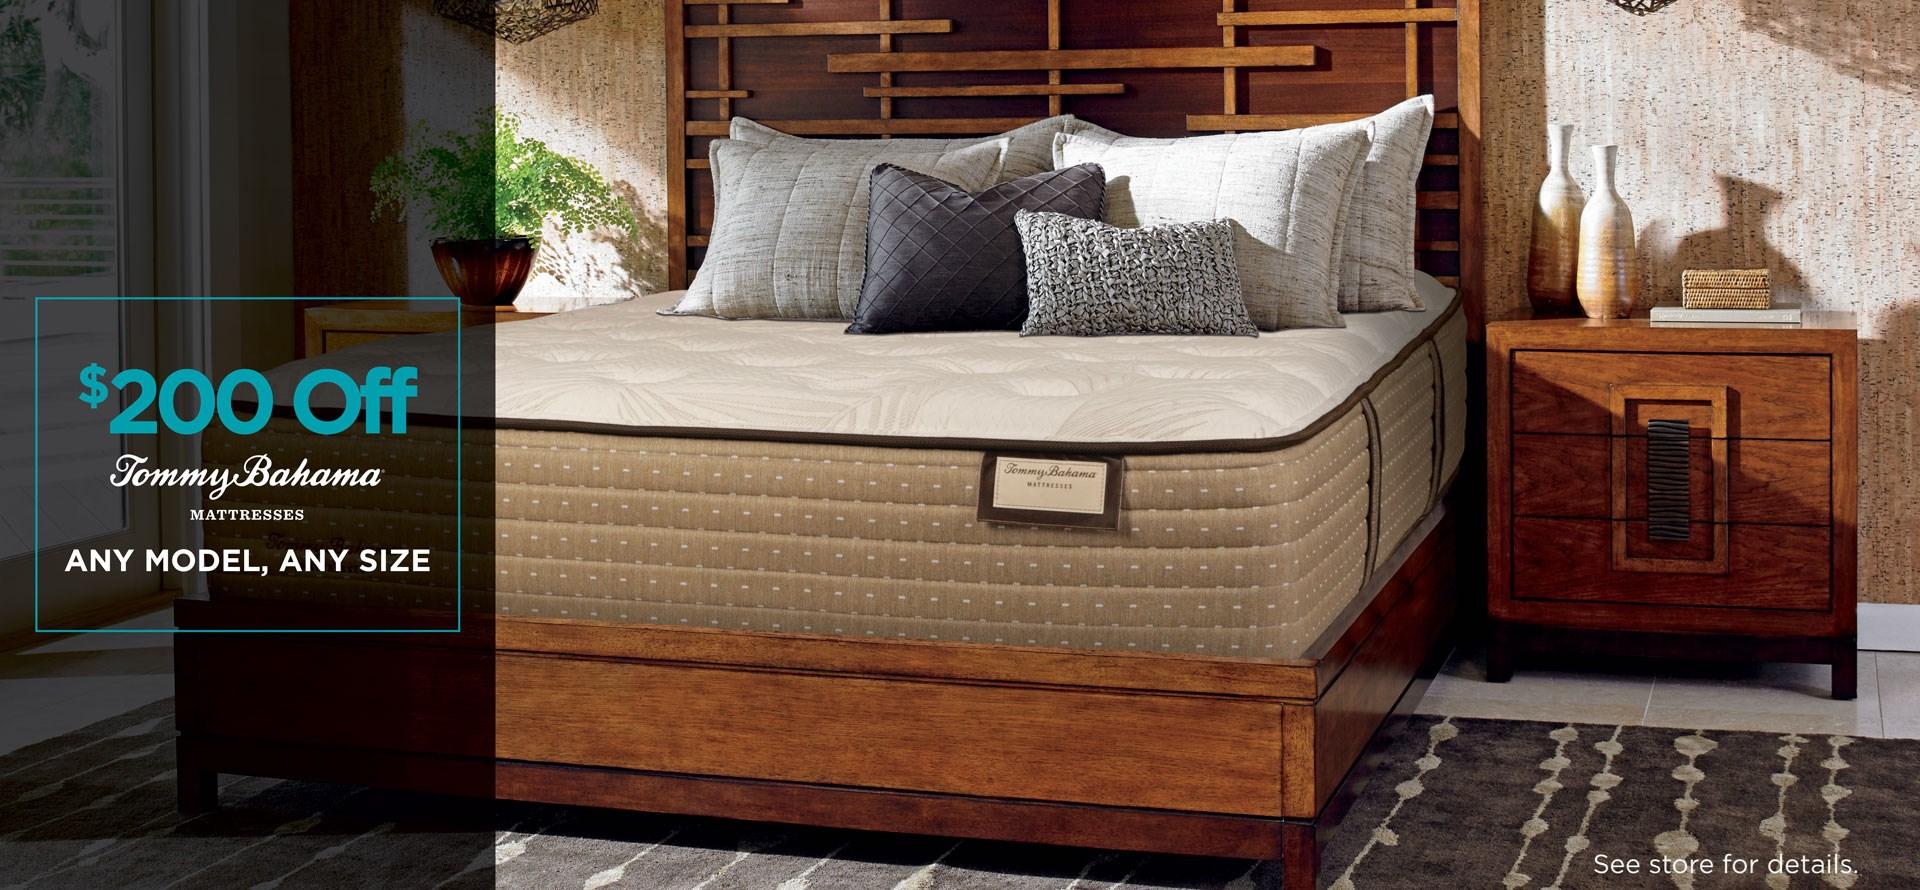 $200 off Tommy mattress